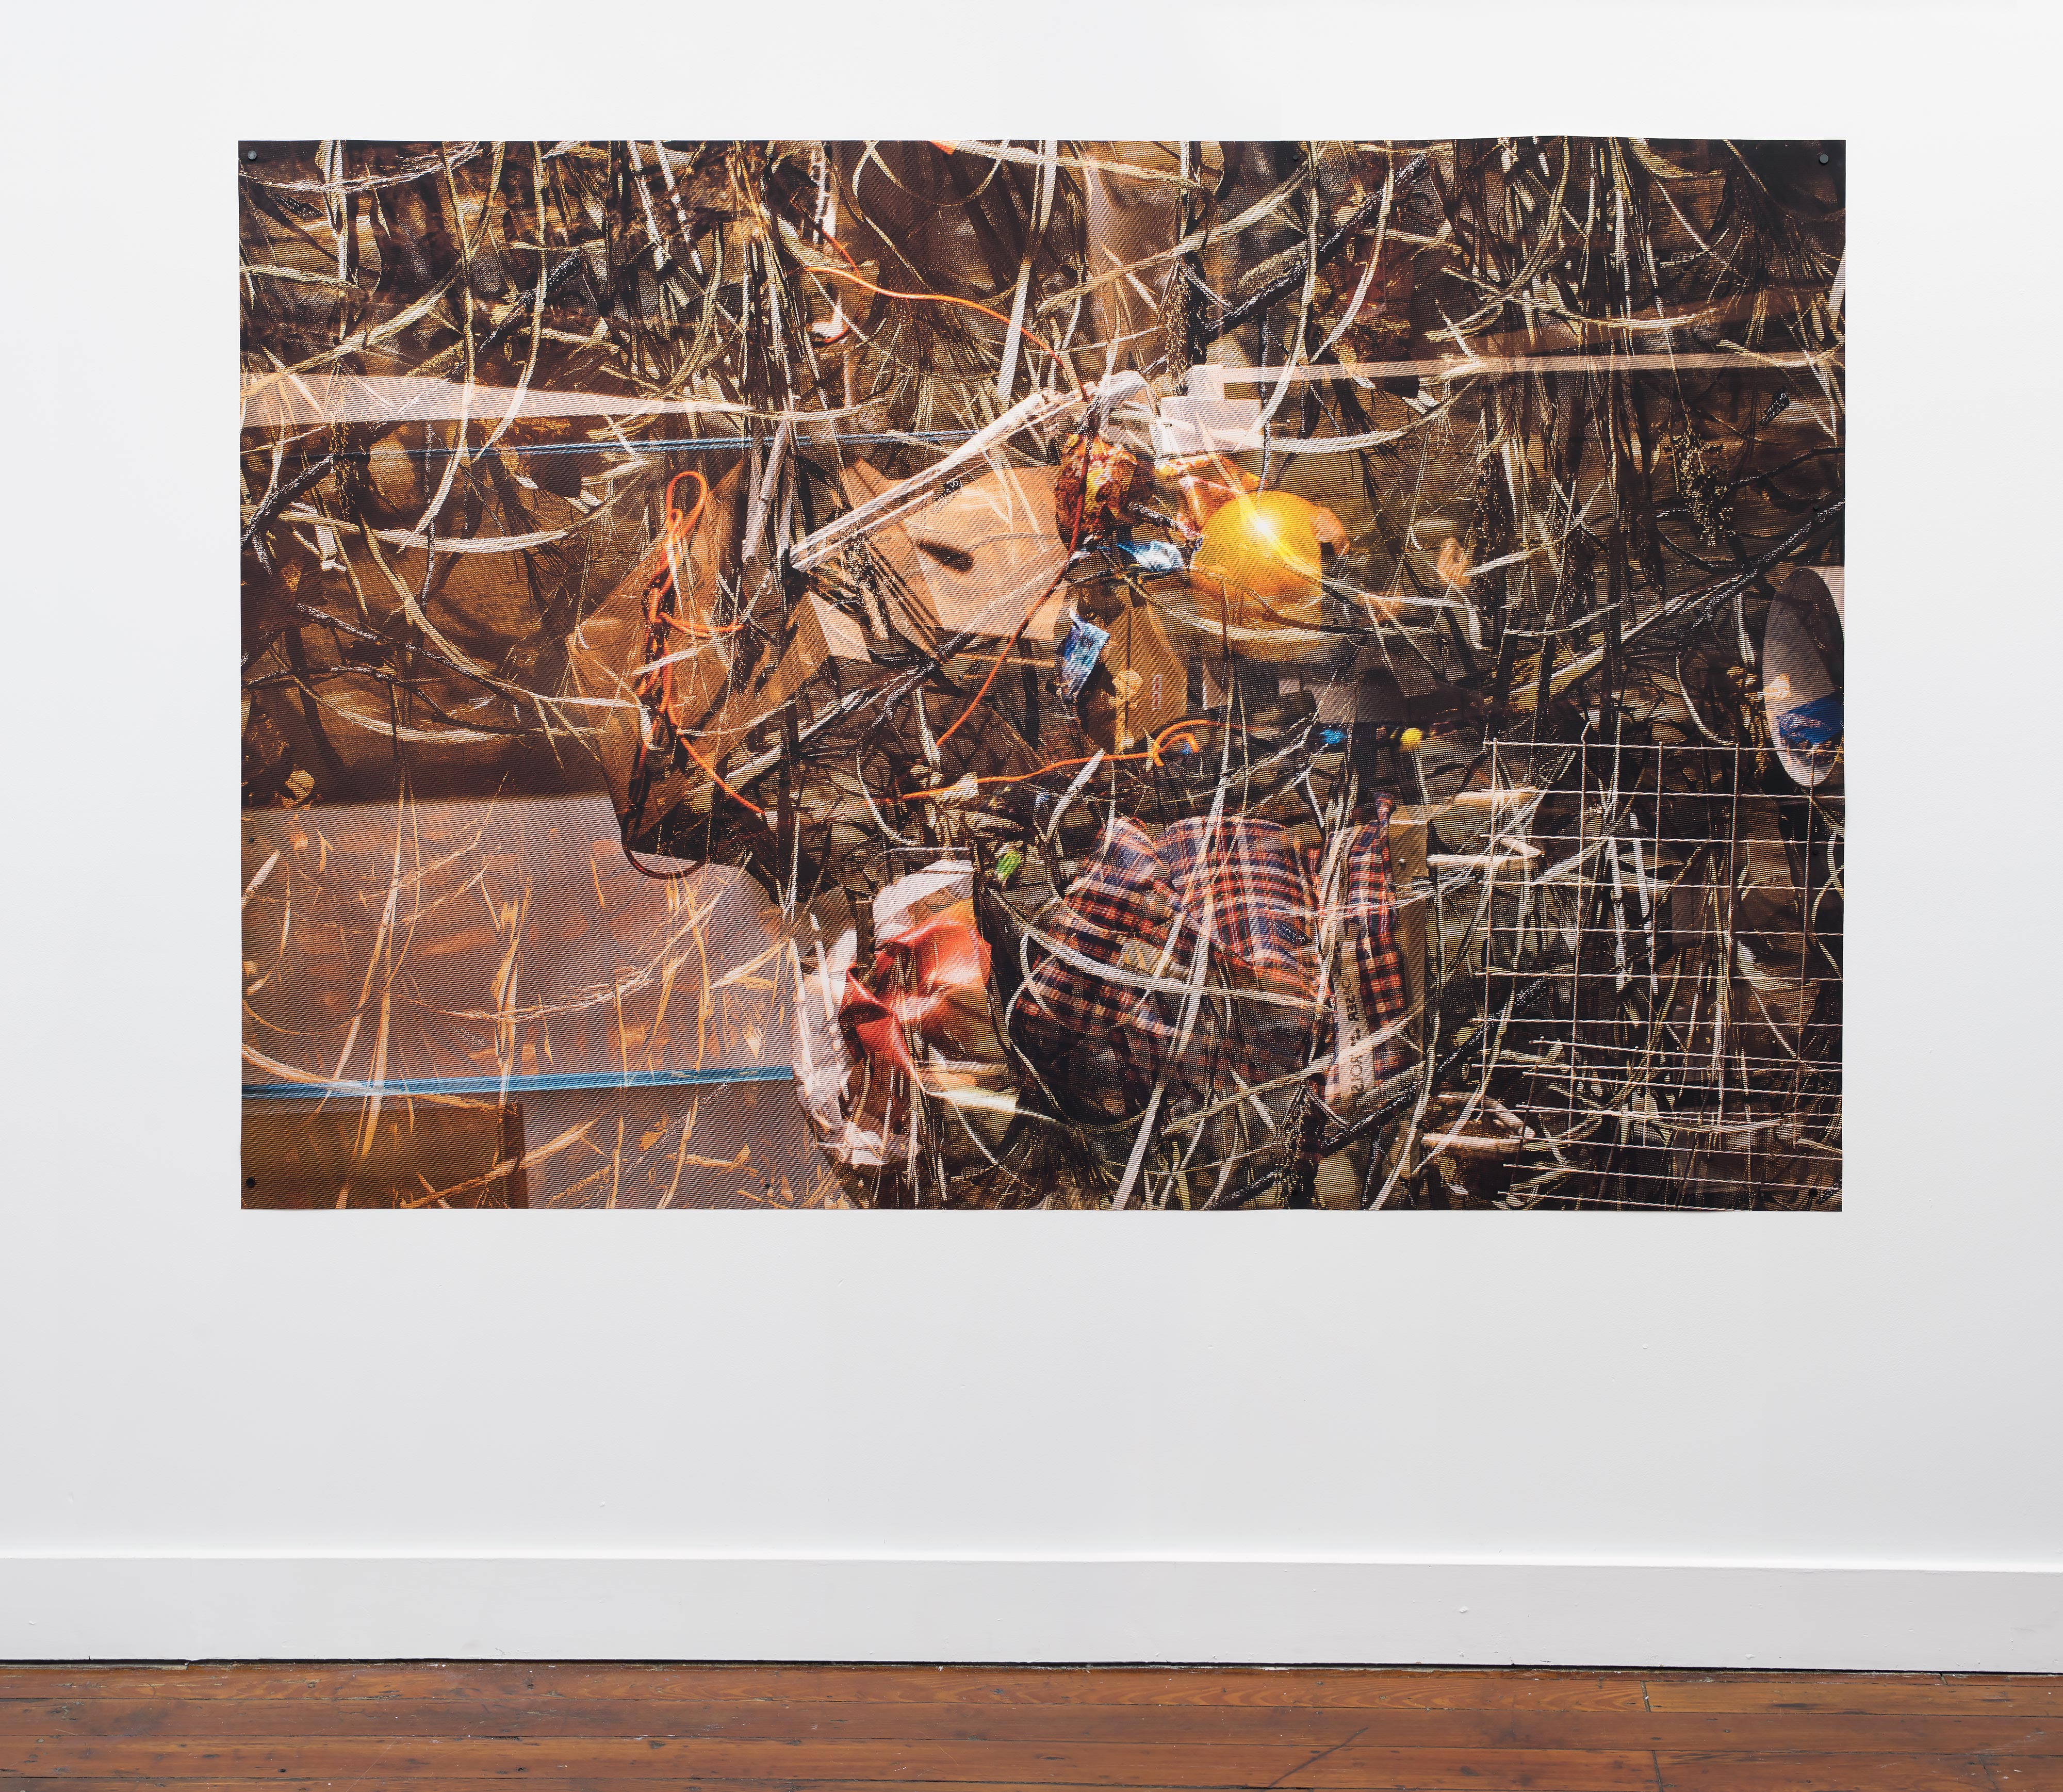 ELLEN BROOKS<br>Untitled (cardboard box)<br>2013<br>Digital pigment print<br>58 x 87 in (147 x 221 cm)